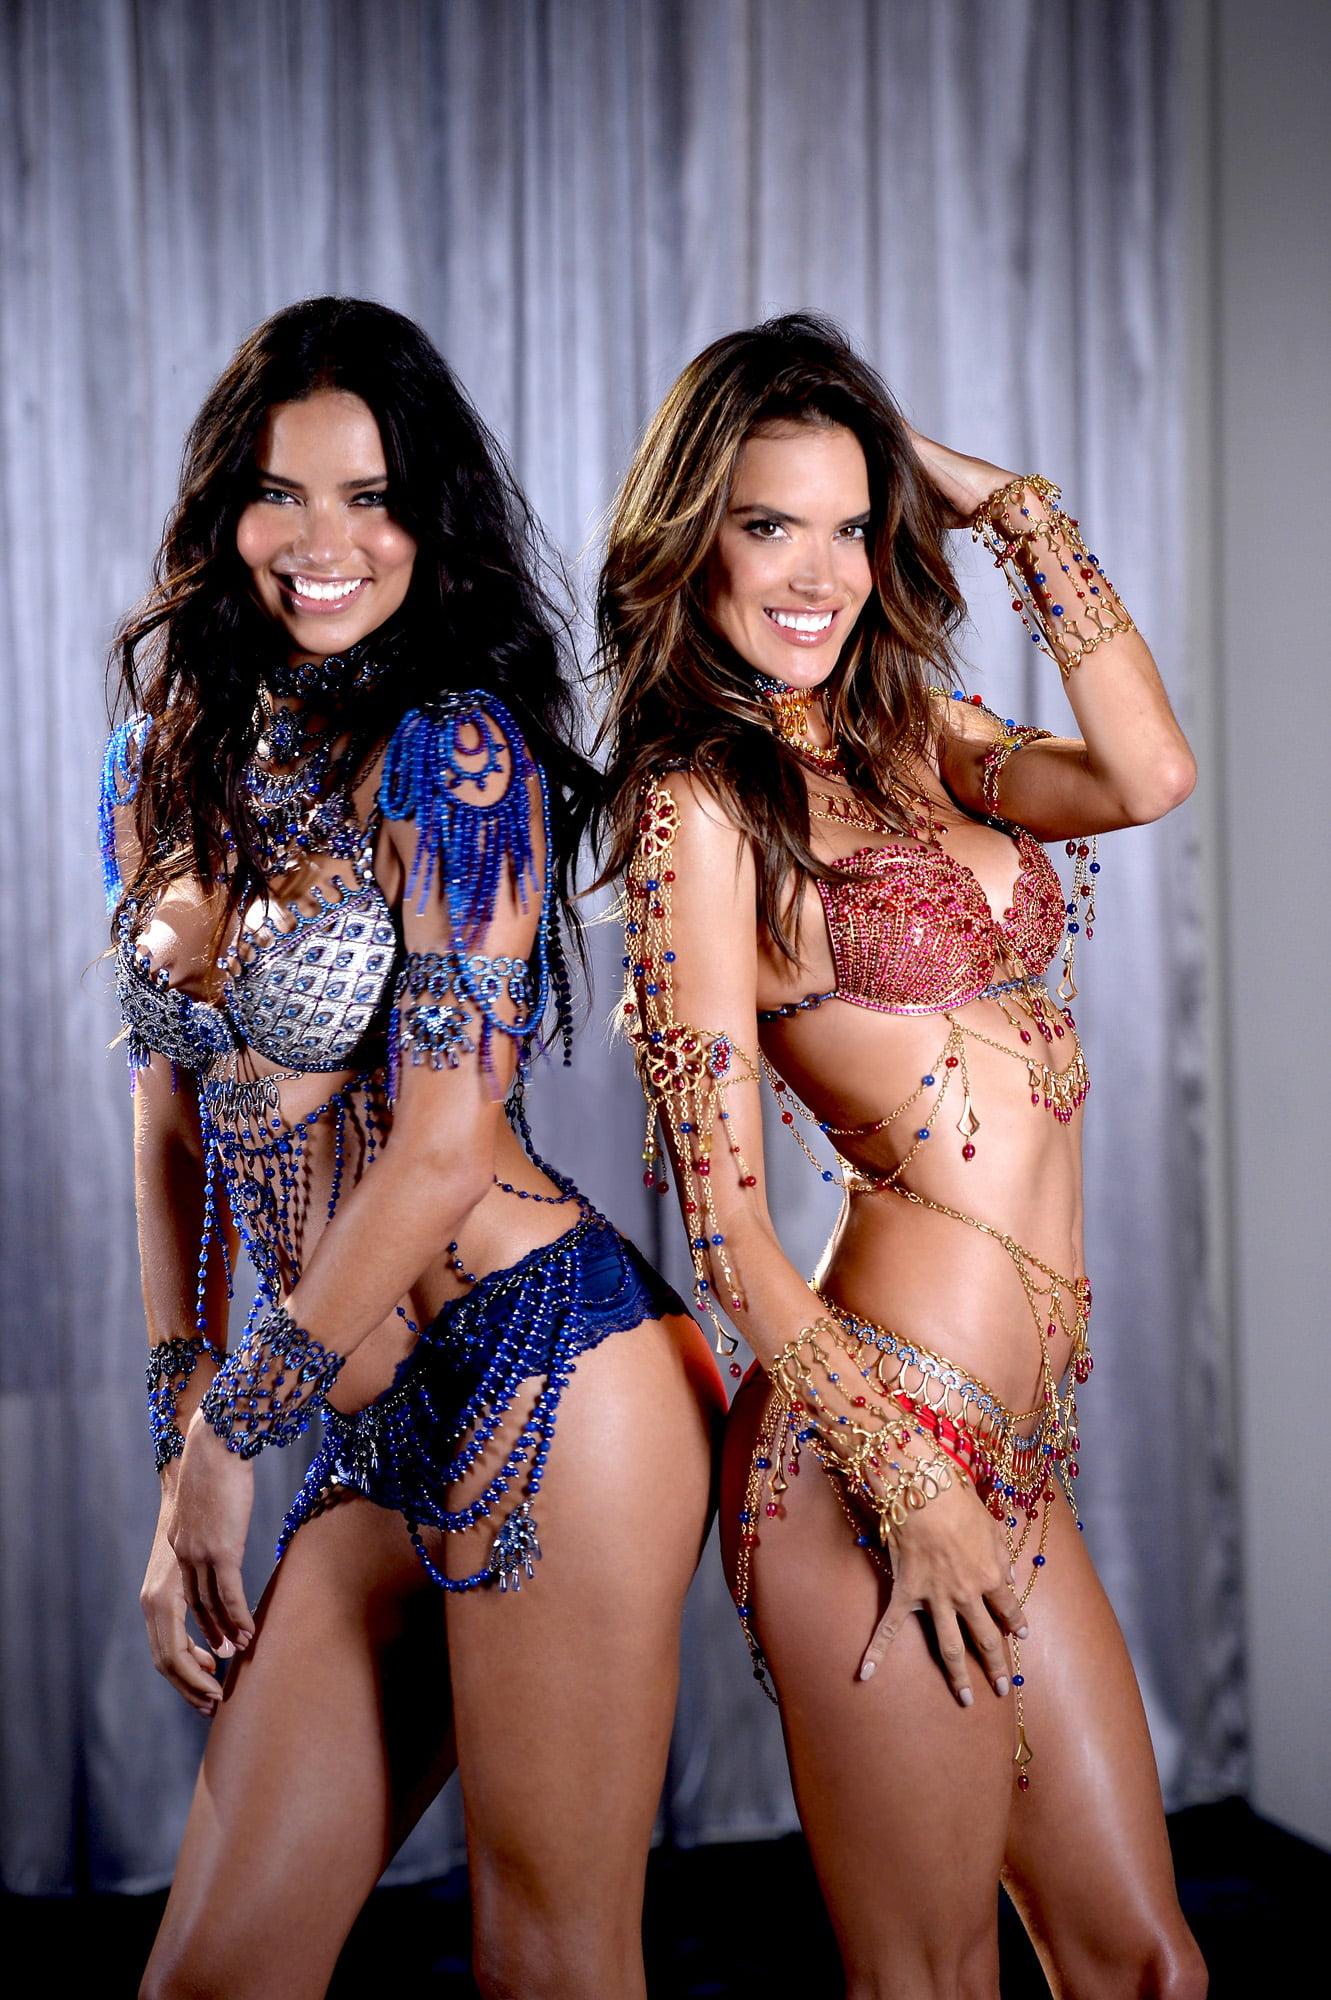 Adriana Lima and Alessandra Ambrosio #3